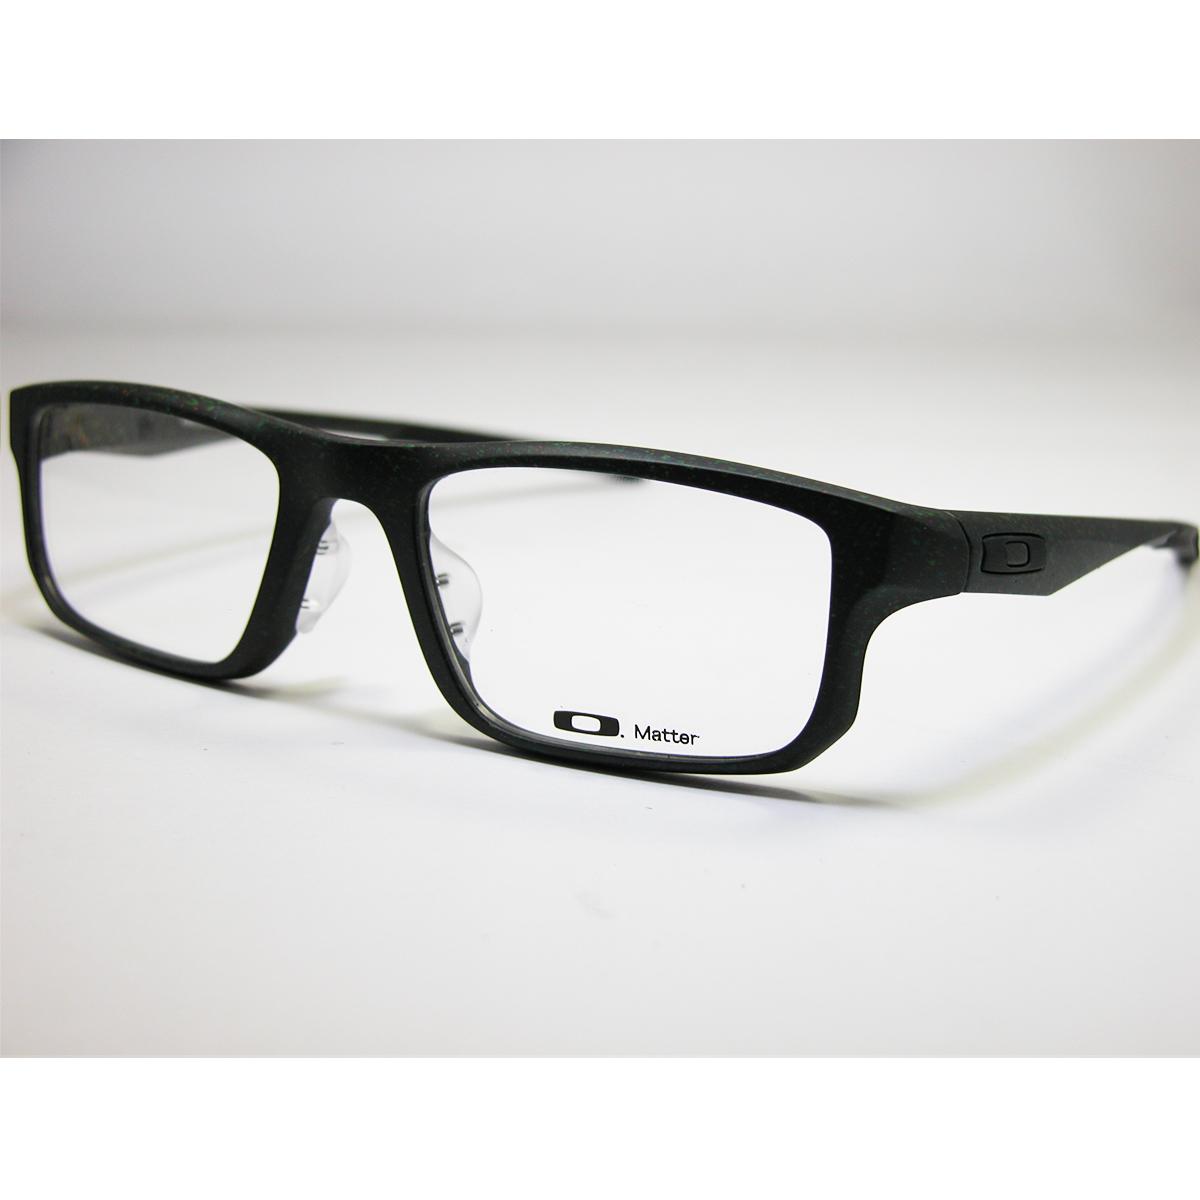 6bfbfb9ccf OAKLEY Oakley VOLTAGE OX8066-0553 mens eyewear sunglasses 10P20Nov15